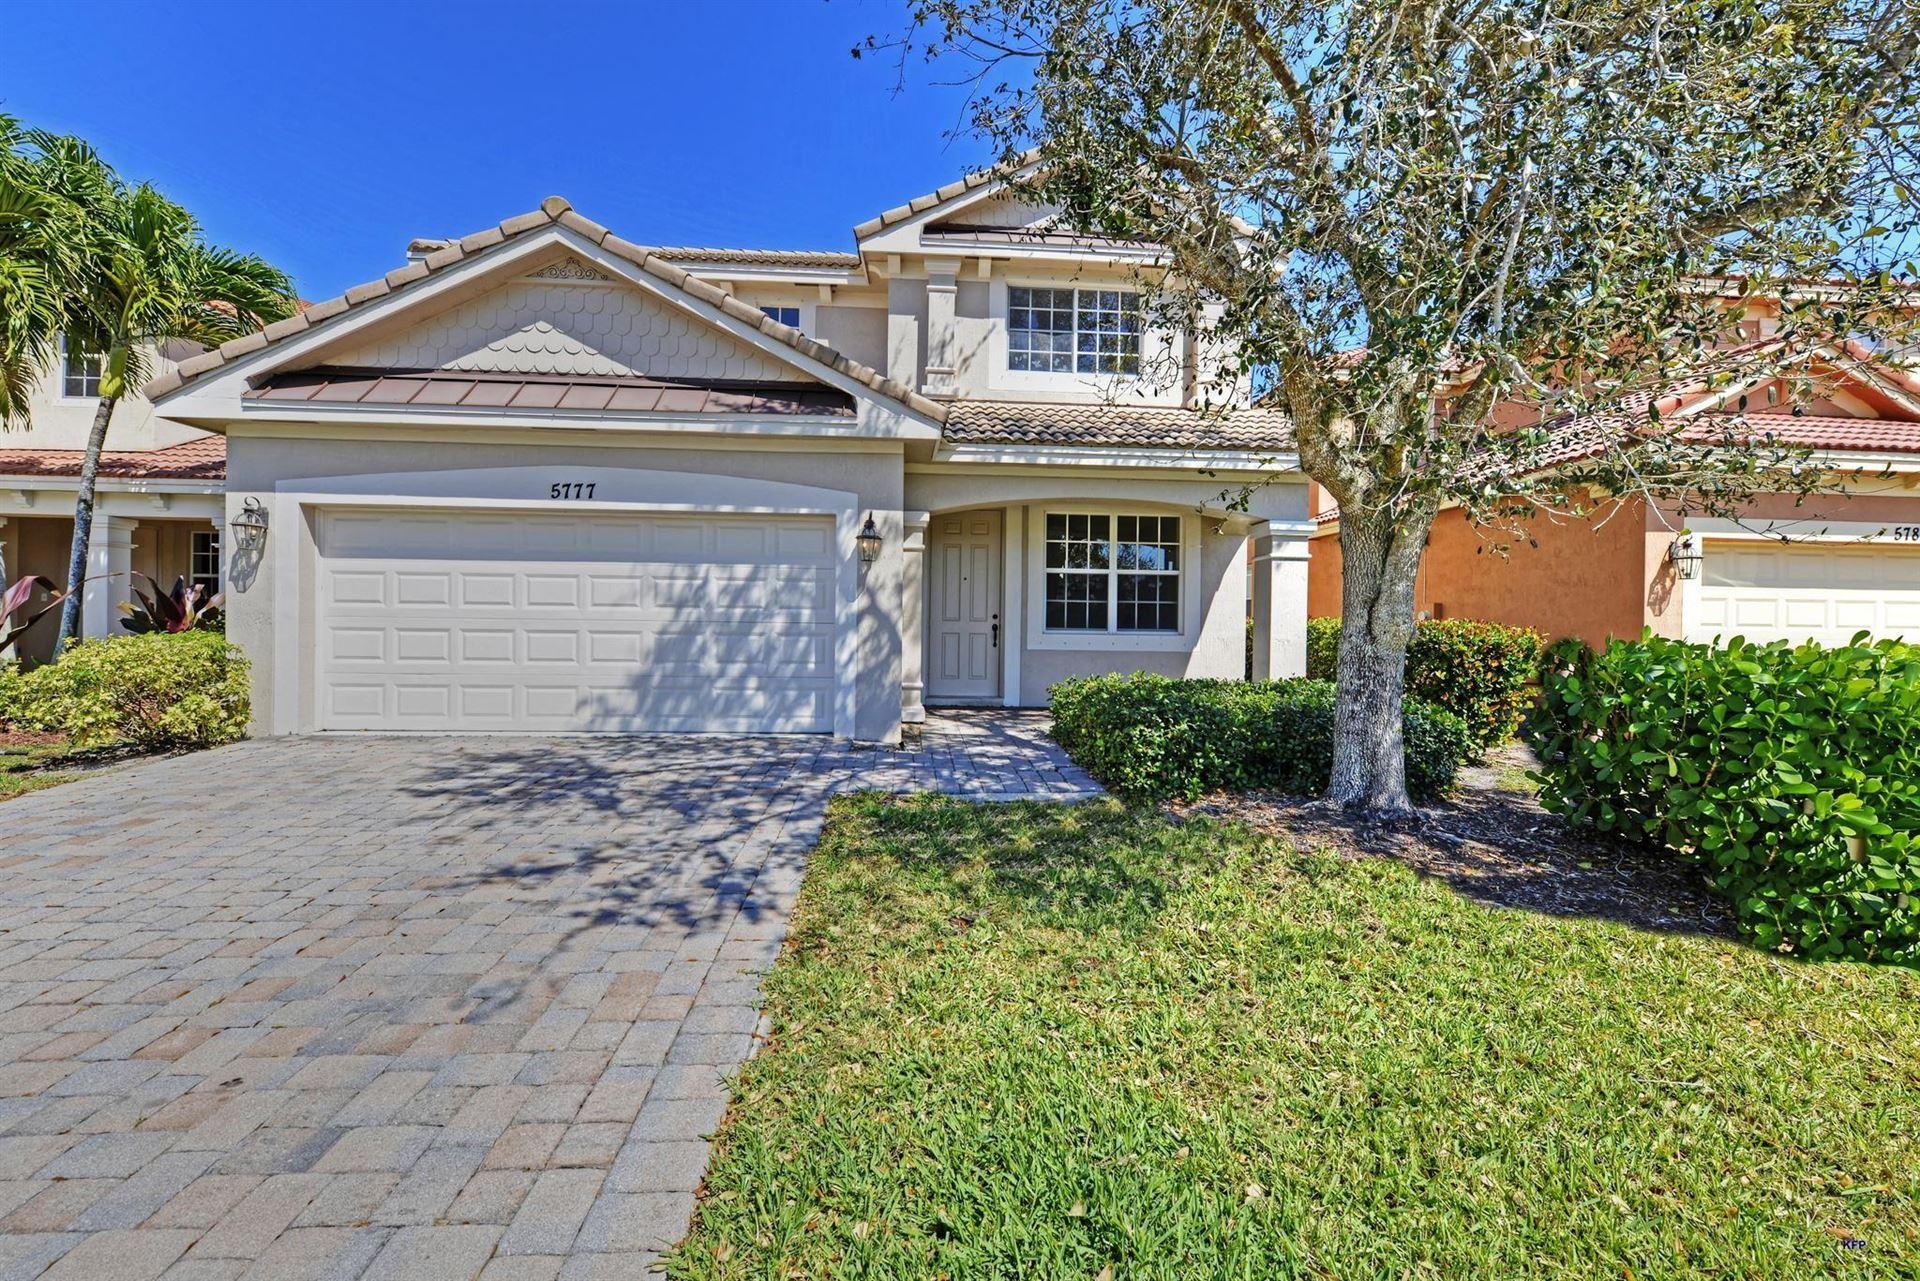 5777 SE Crooked Oak Avenue, Hobe Sound, FL 33455 - #: RX-10608131